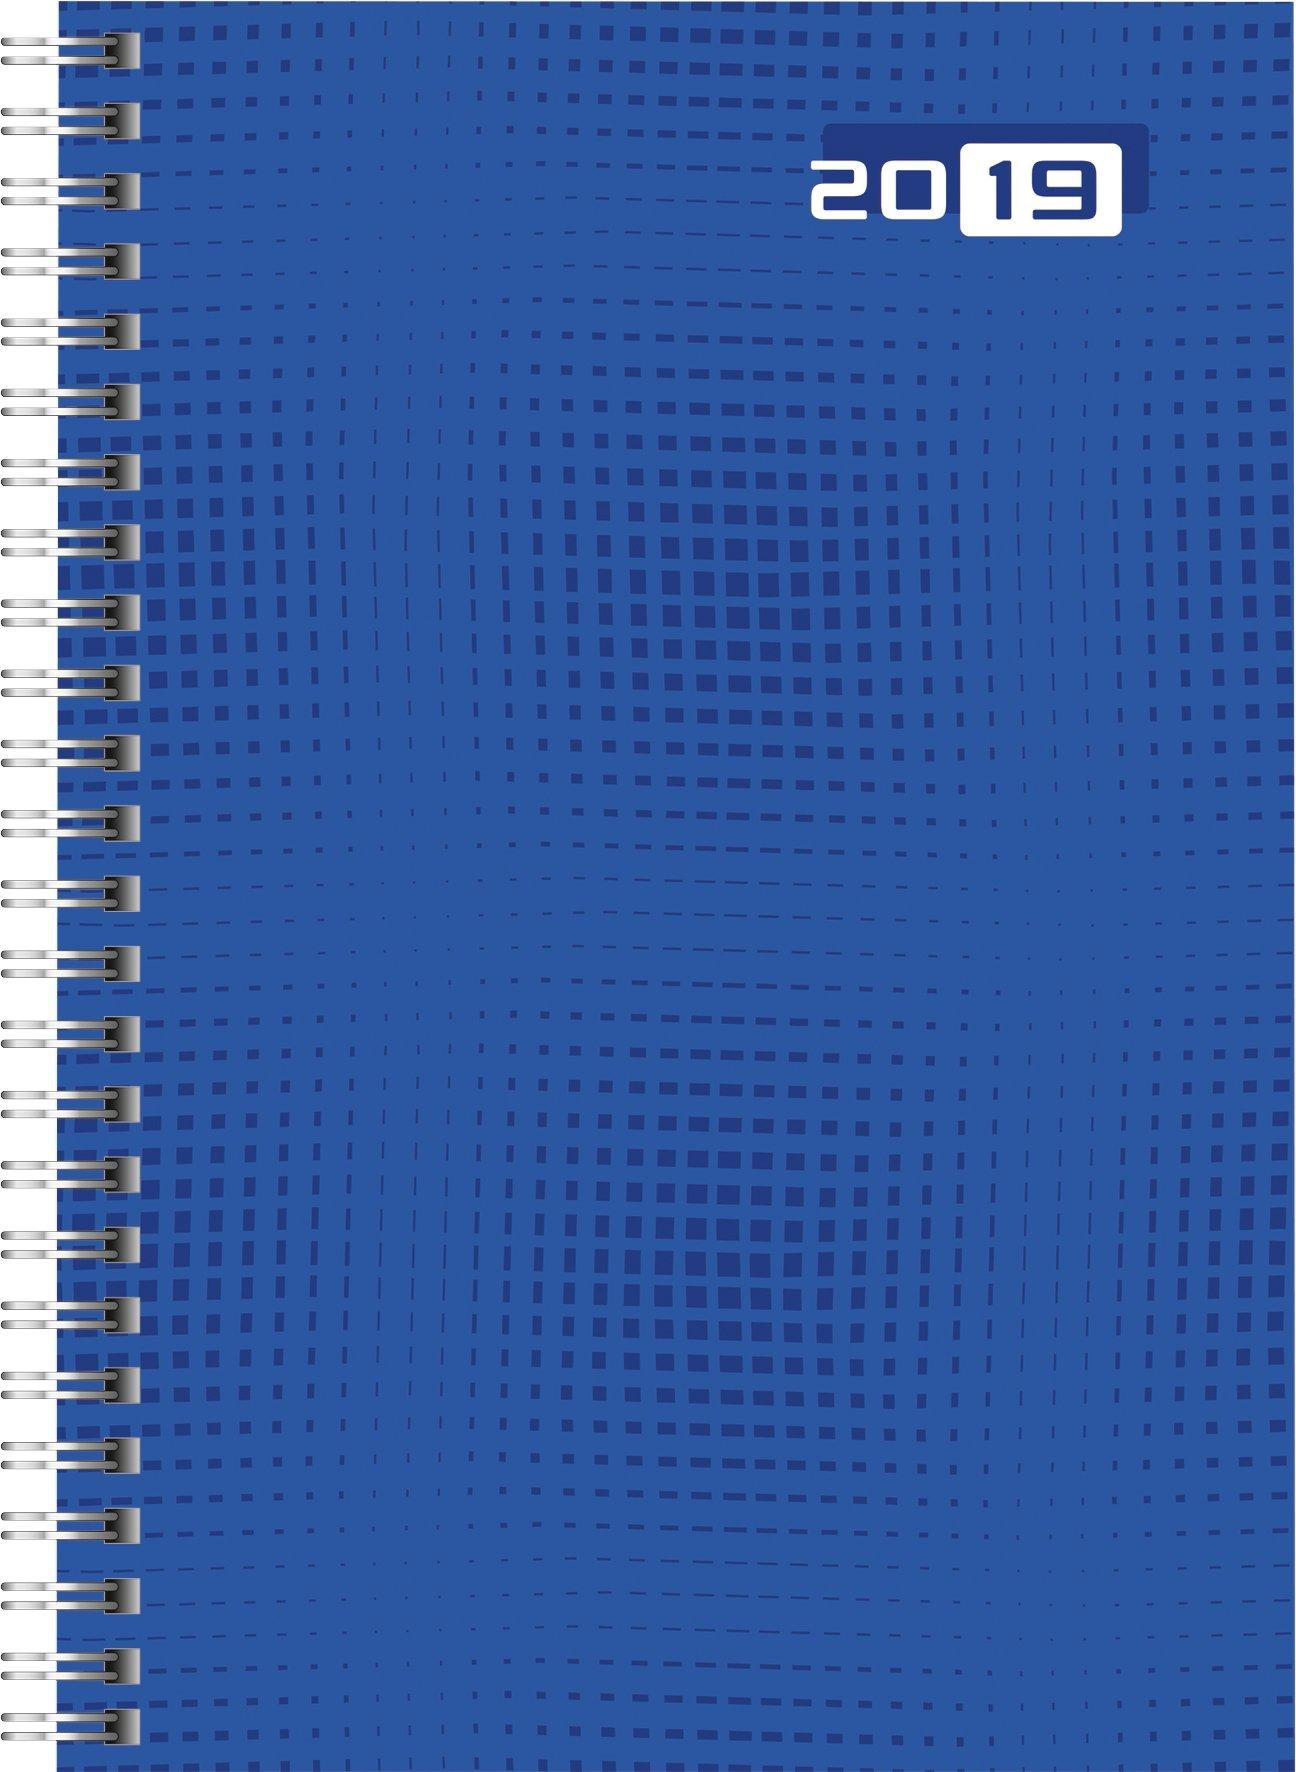 Rido/idé 702100702 Buchkalender futura 2 (2 Seiten =1 Woche, 148 x 208 mm, Grafik-Einband, Kalendarium 2019, Wire-O-Bindung) blau